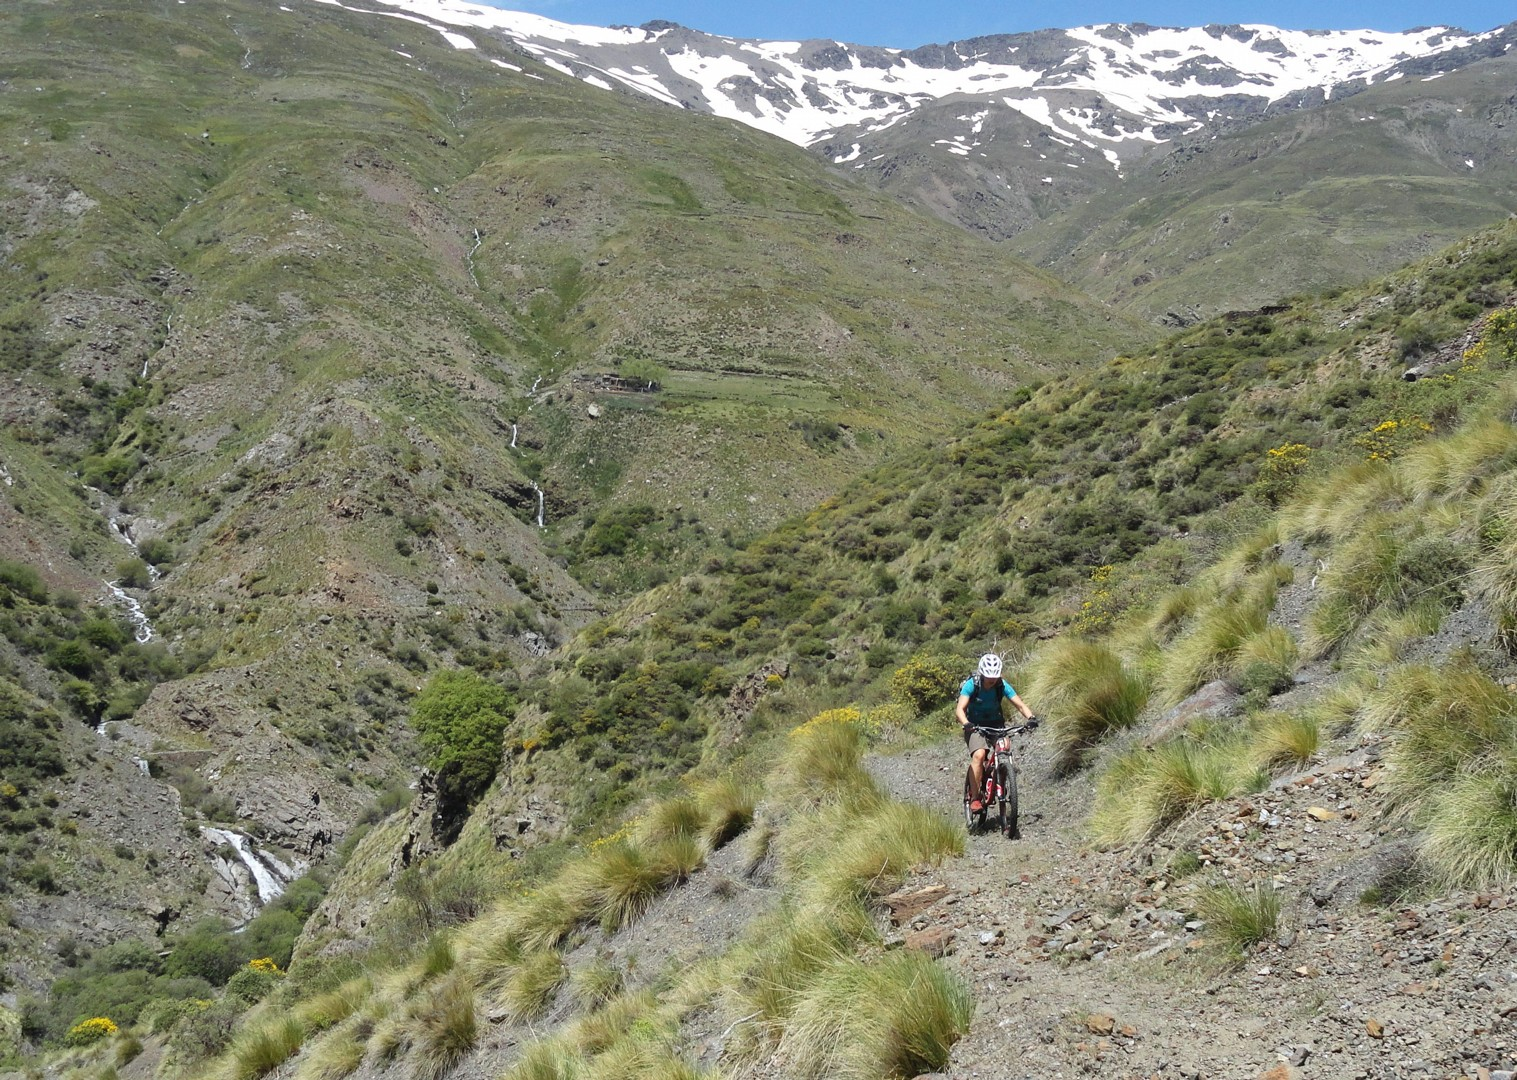 sierra-nevada-biking-in-spain-saddle-skedaddle.jpg - Spain - Sensational Sierra Nevada - Mountain Biking